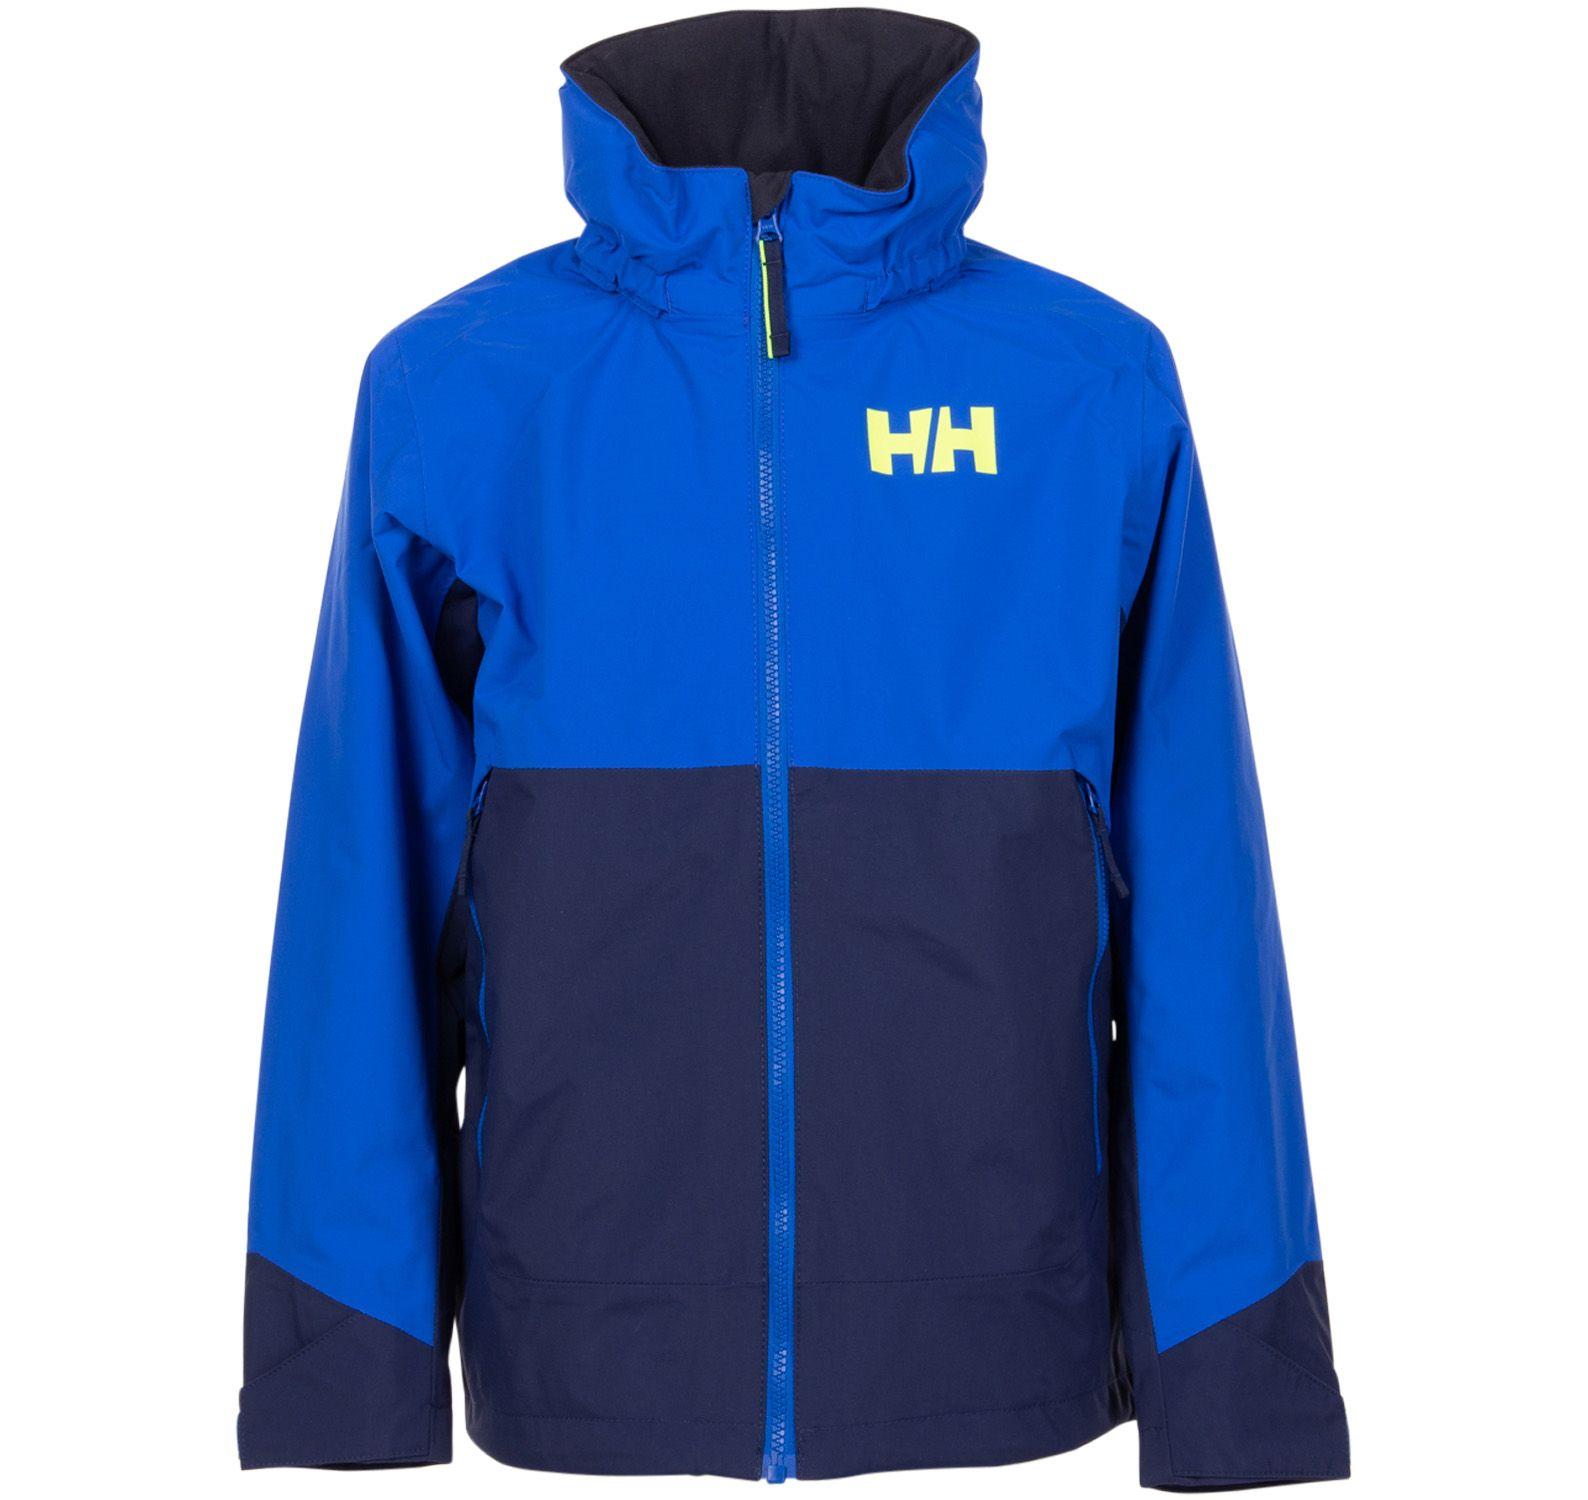 jr ascent jacket, 563 olympian blue, 152